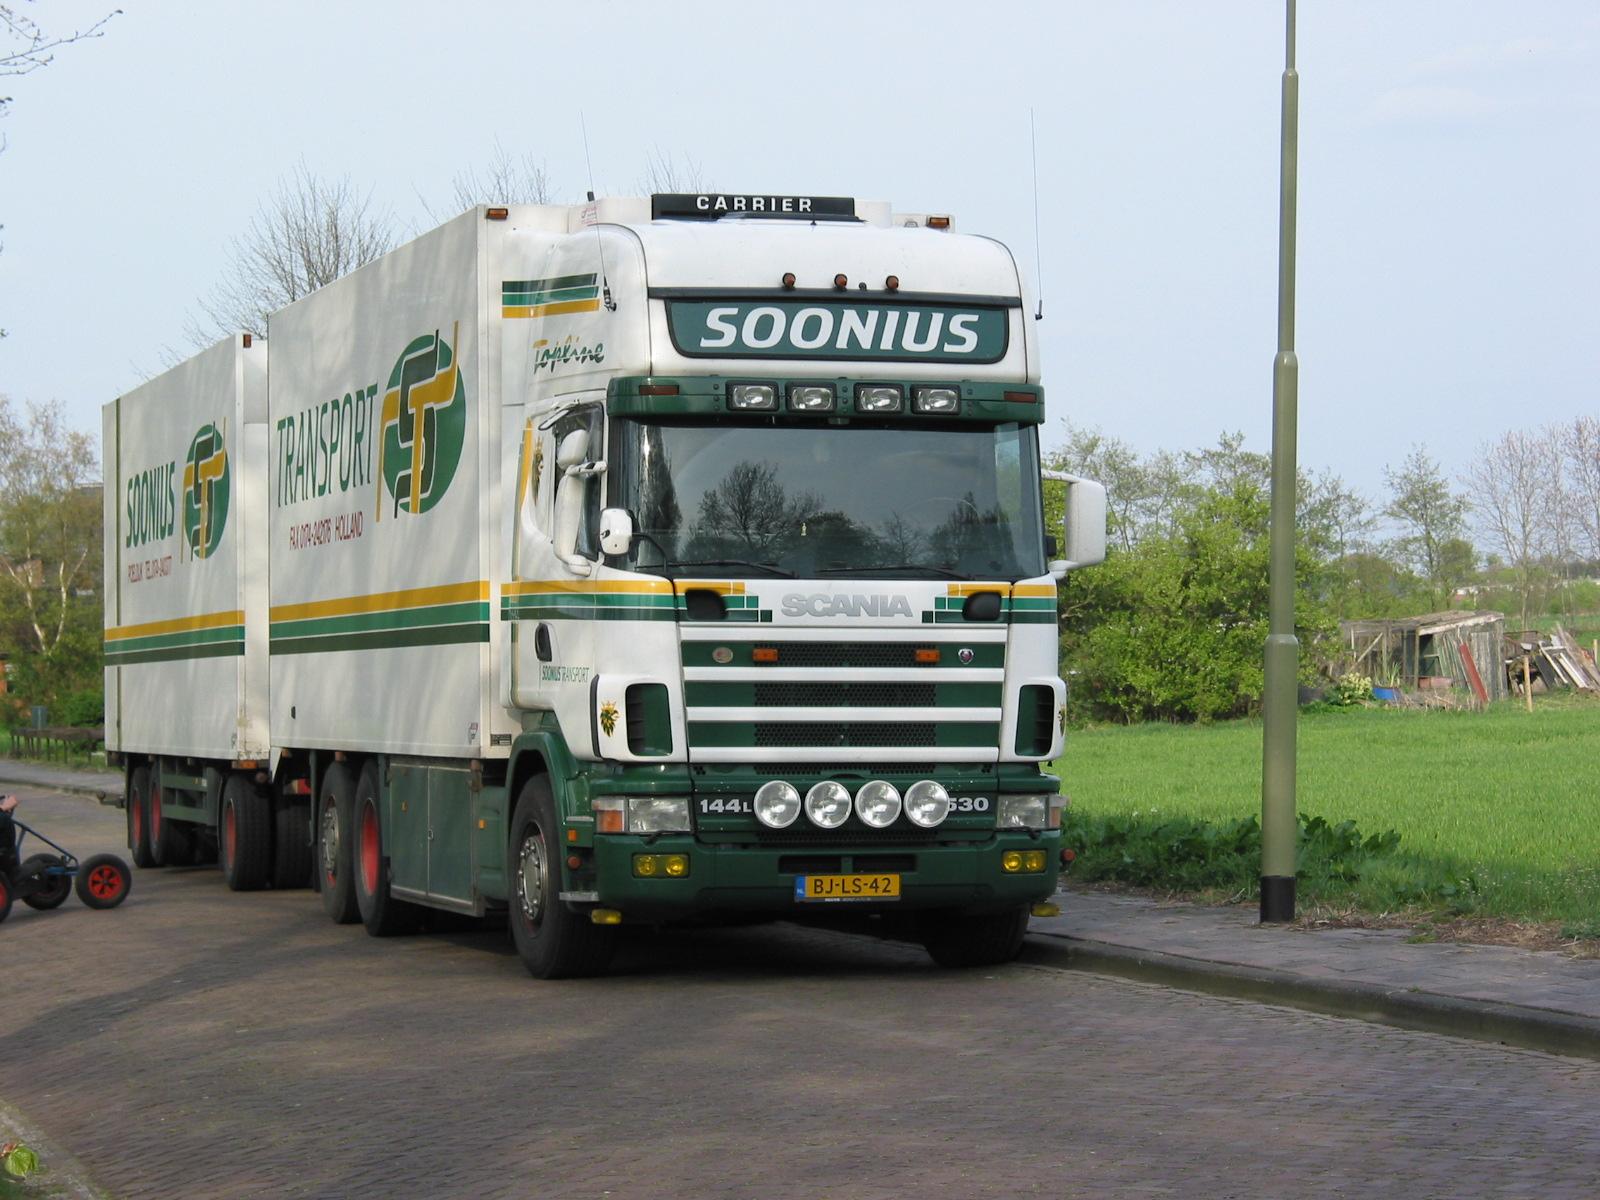 Scania-Harrie-Kuiper--Nw-Weerdinge-2004